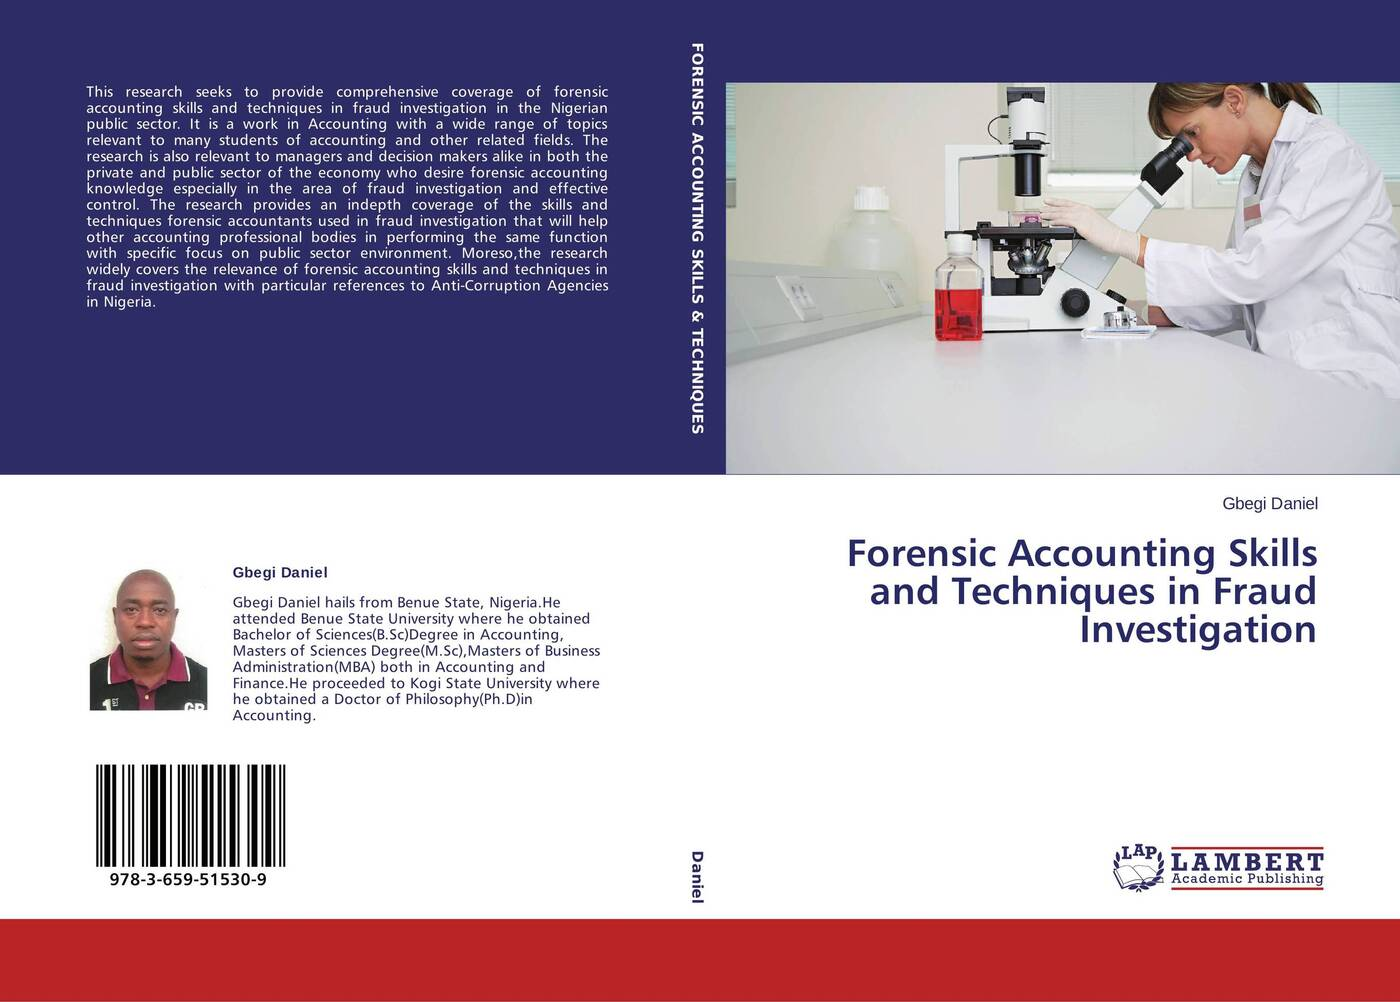 Gbegi Daniel Forensic Accounting Skills and Techniques in Fraud Investigation zabihollah rezaee forensic accounting and financial statement fraud volume i fundamentals of forensic accounting